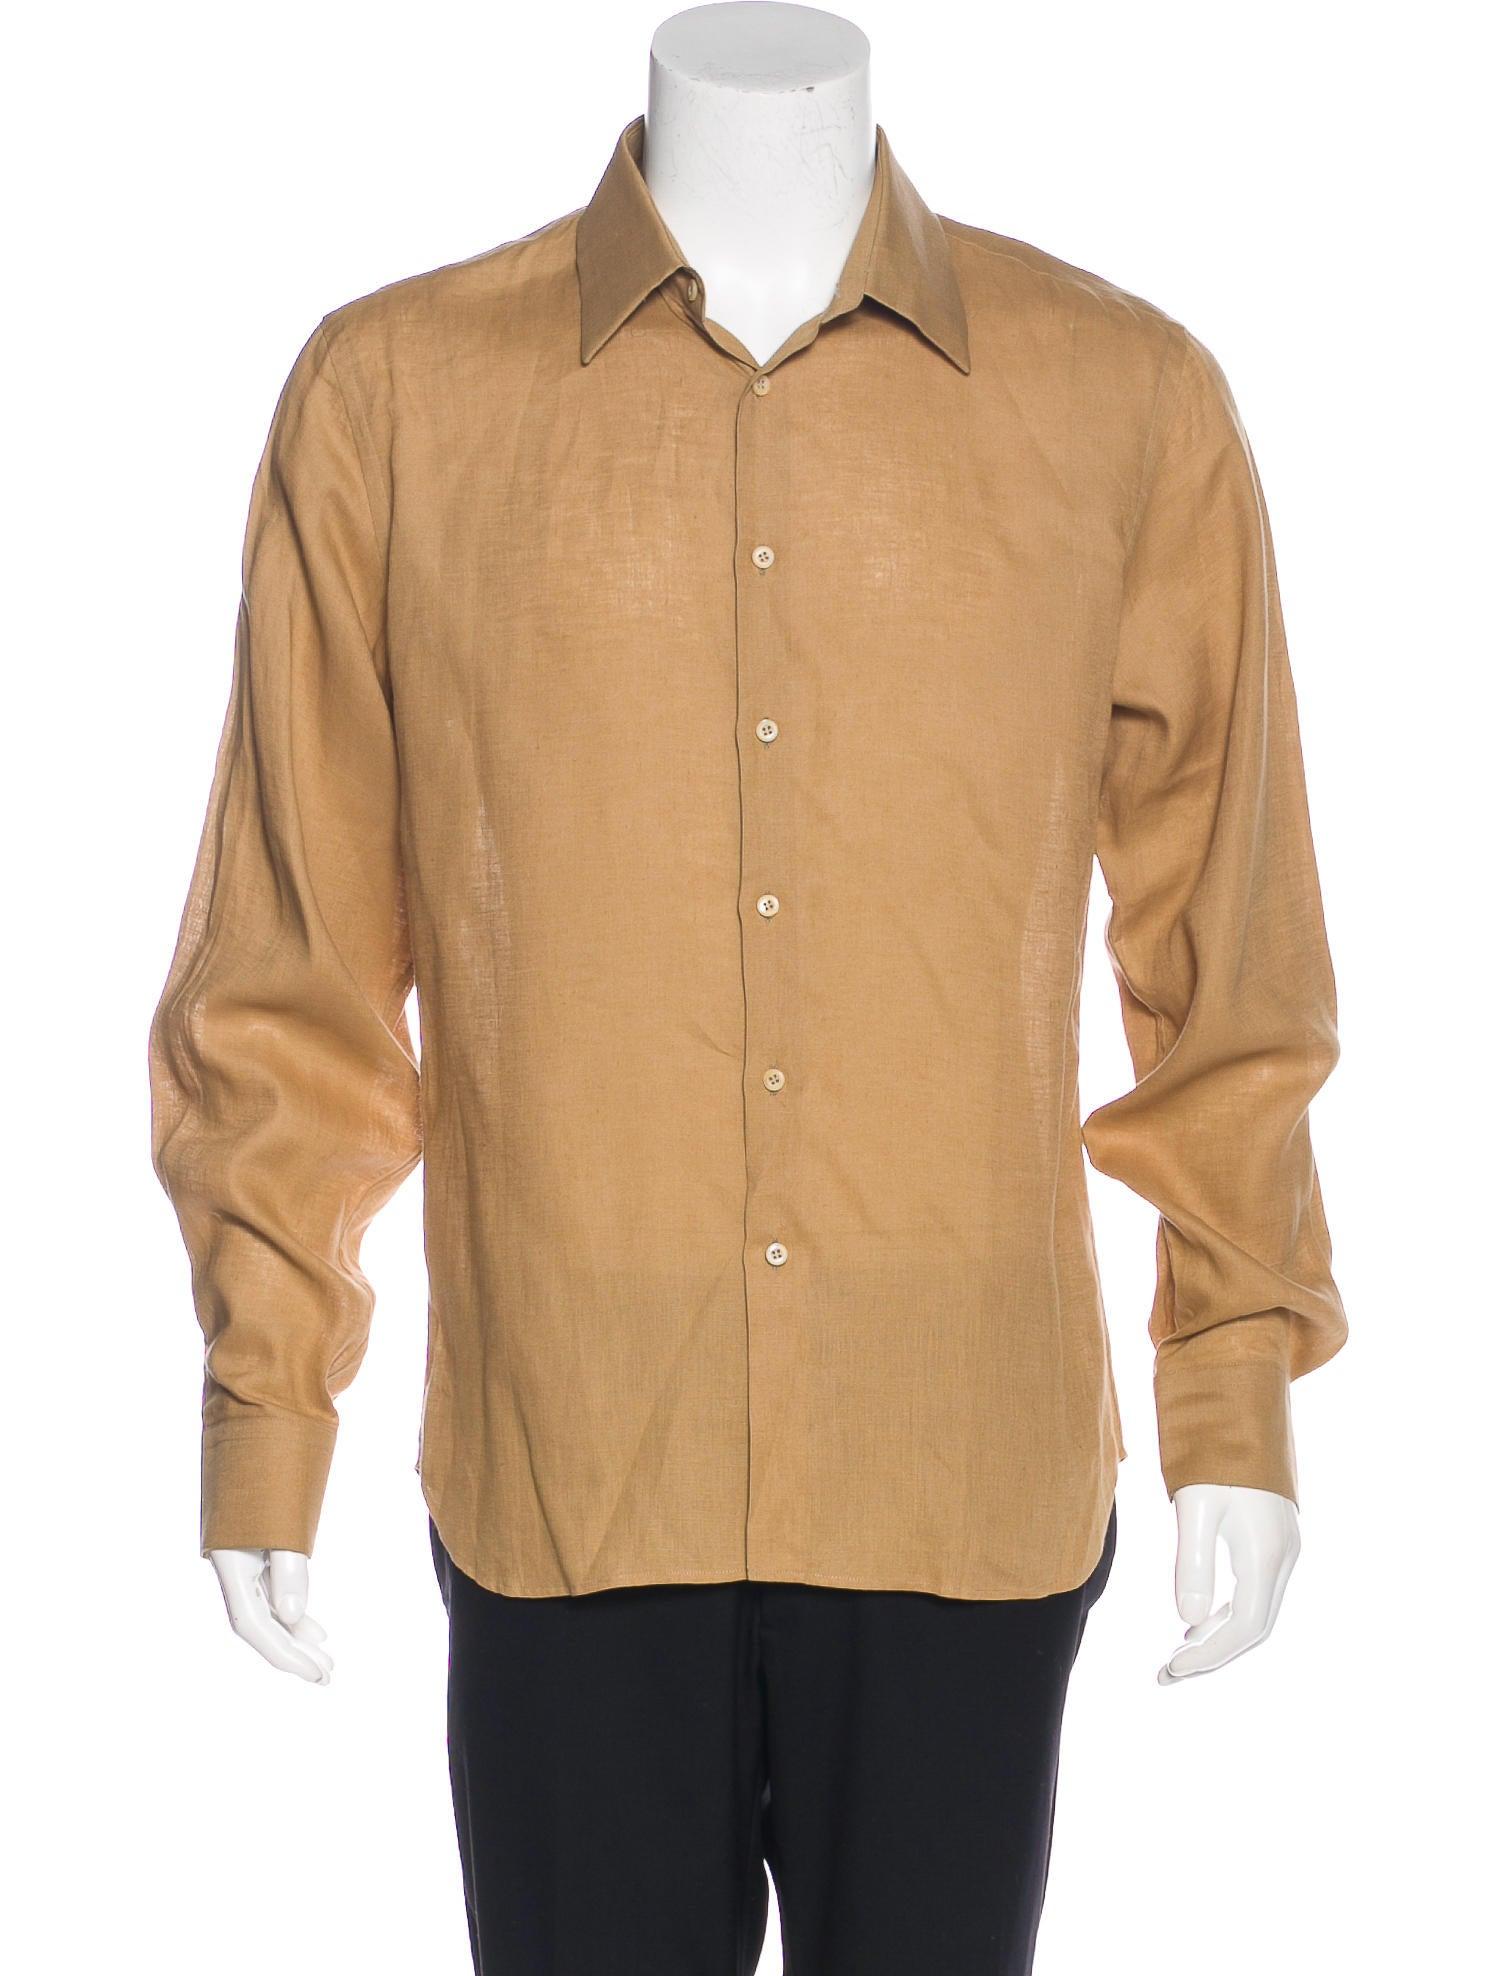 prada linen button up shirt clothing pra160060 the